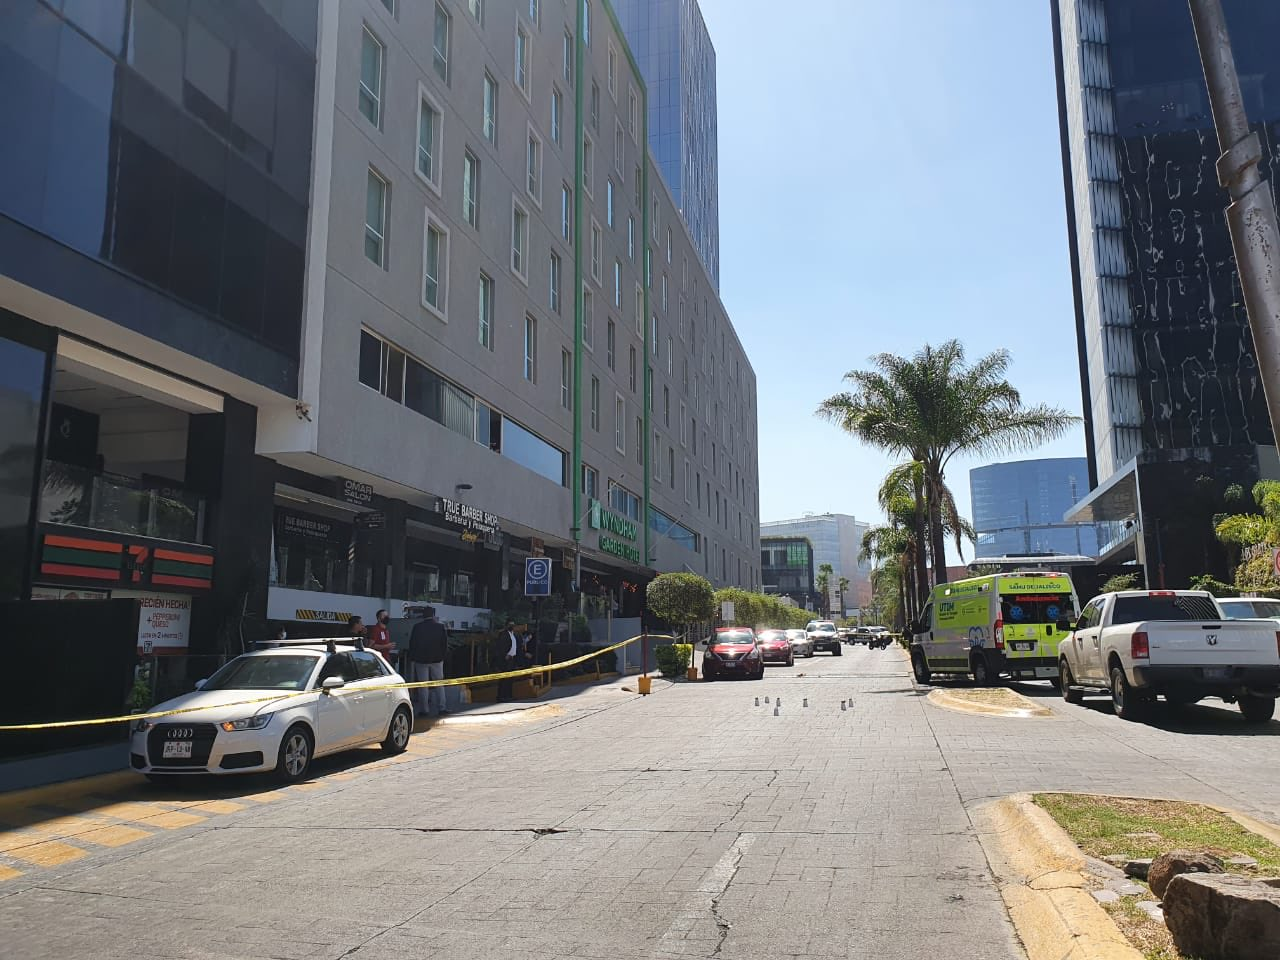 Balacera en zona de Andares en Zapopan, Jalisco